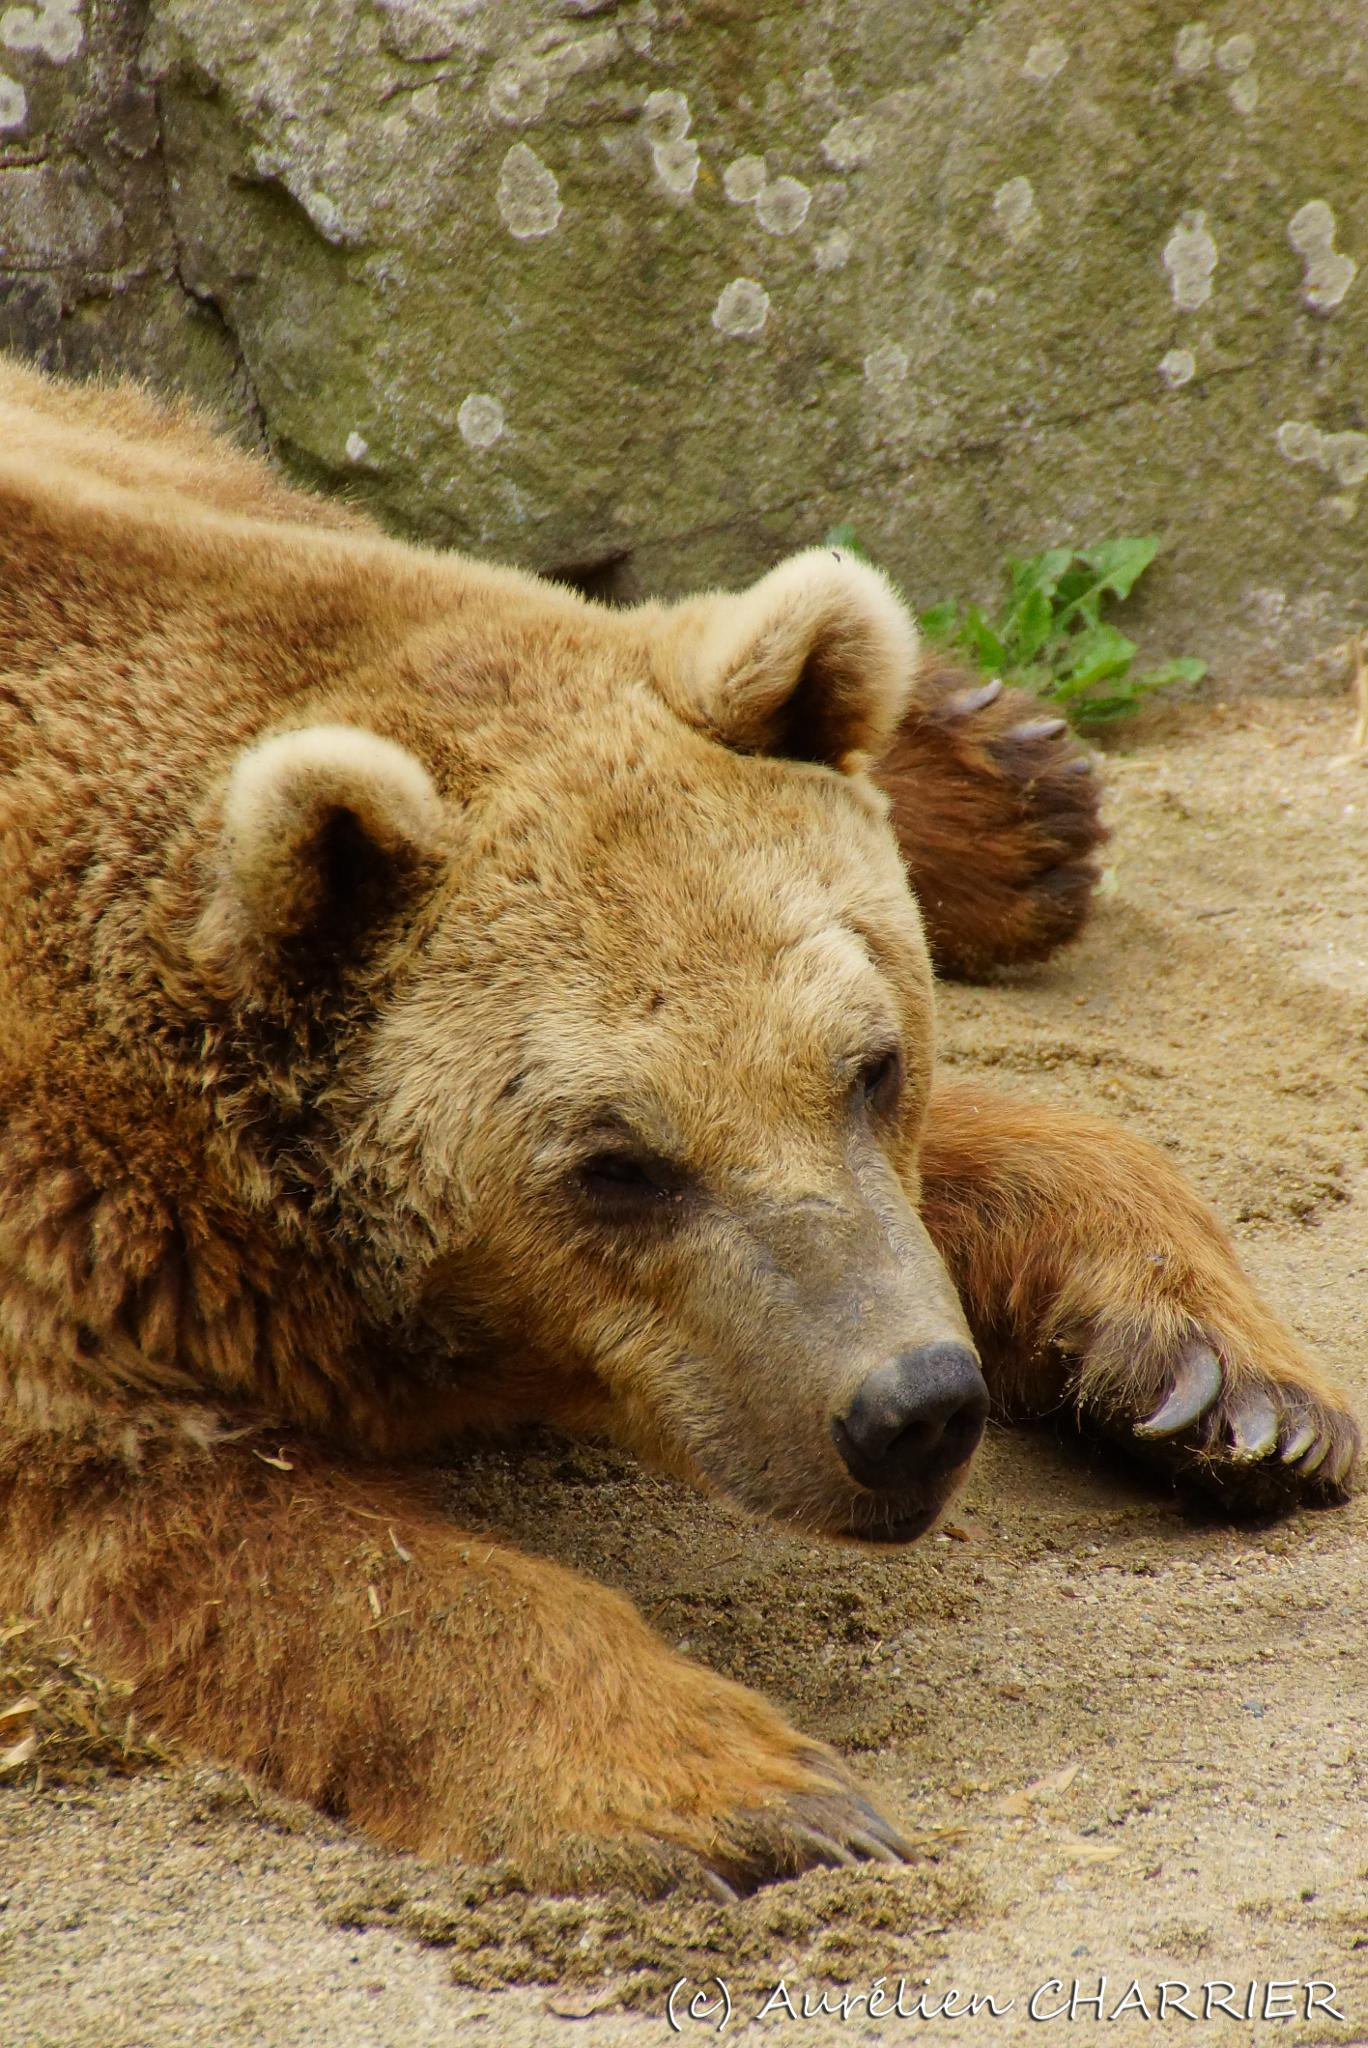 Brown Bear by Aurélien CHARRIER